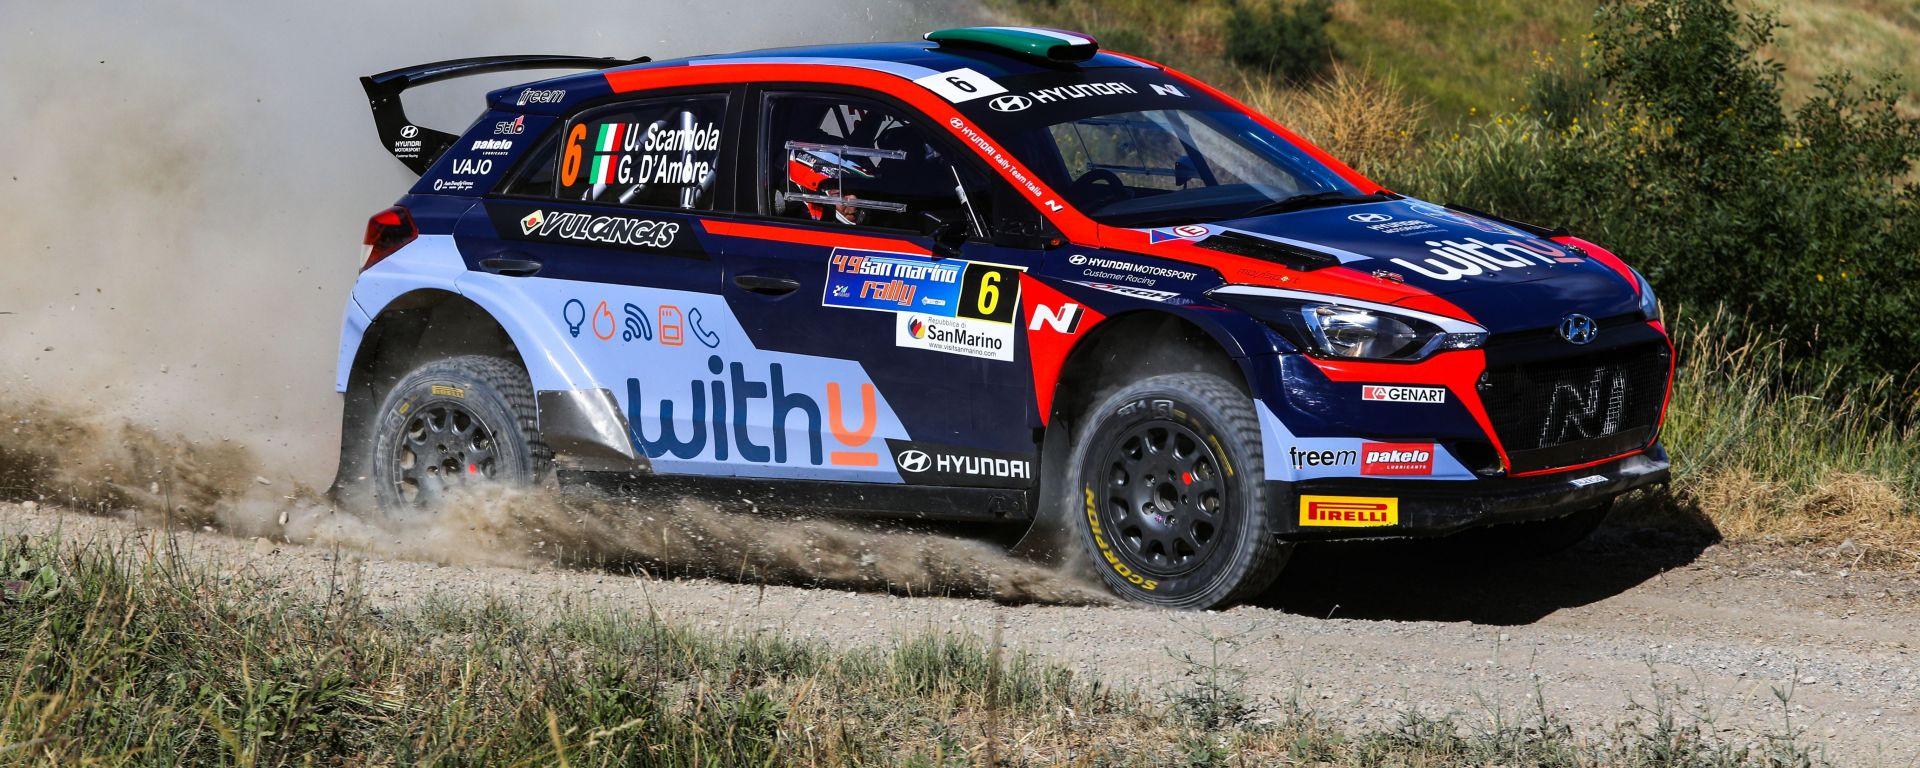 CIR, Rally San Marino 2021: Umberto Scandola (Hyundai)